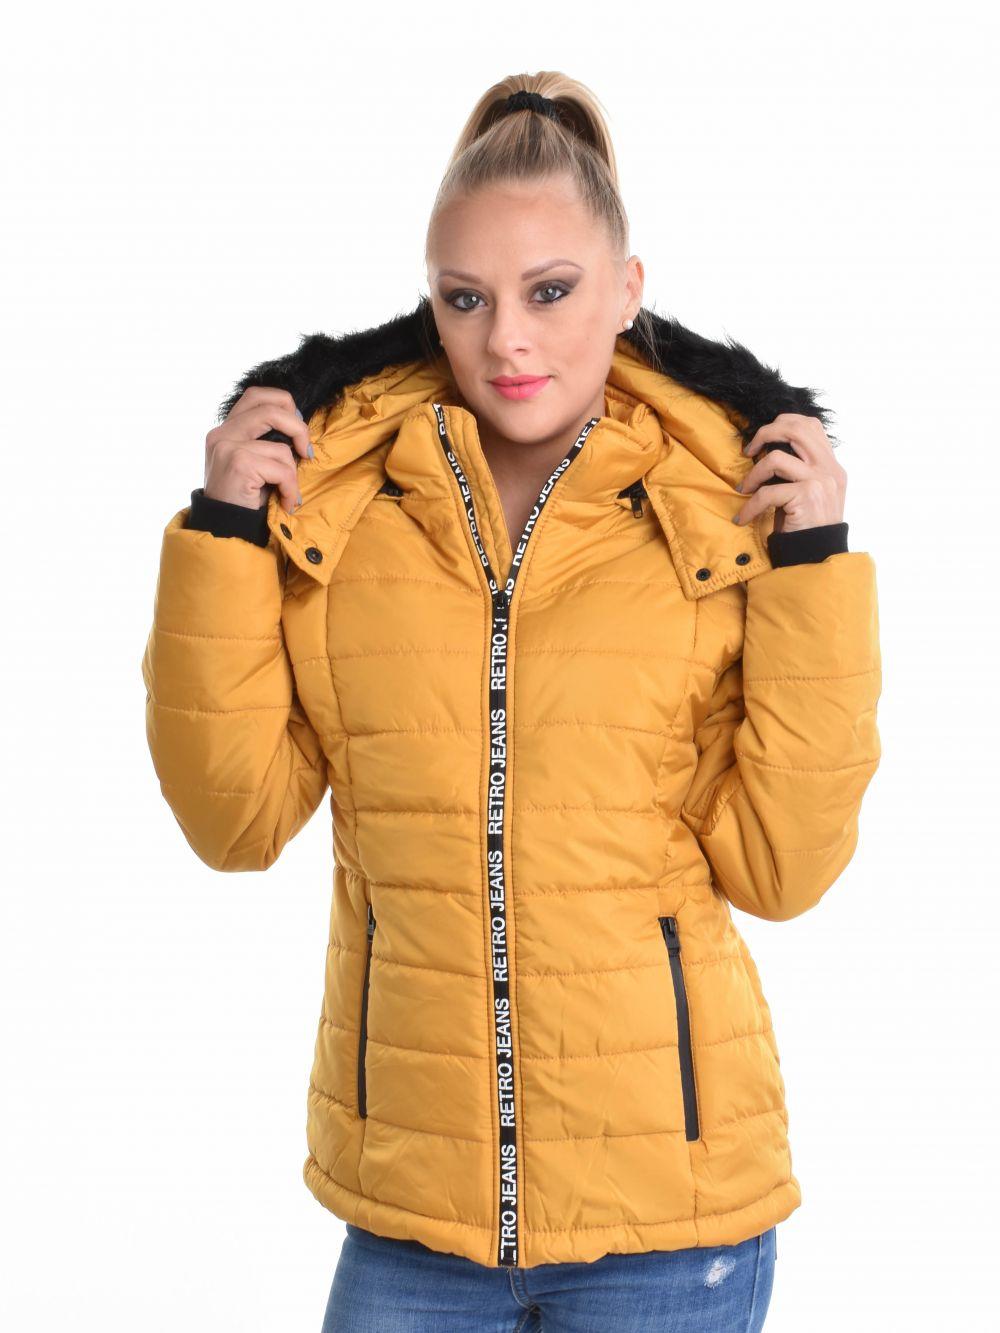 ede3f1b1c5 Retro Jeans női kabát VIOLA JACKET | Markasbolt.hu Hivatalos RETRO ...